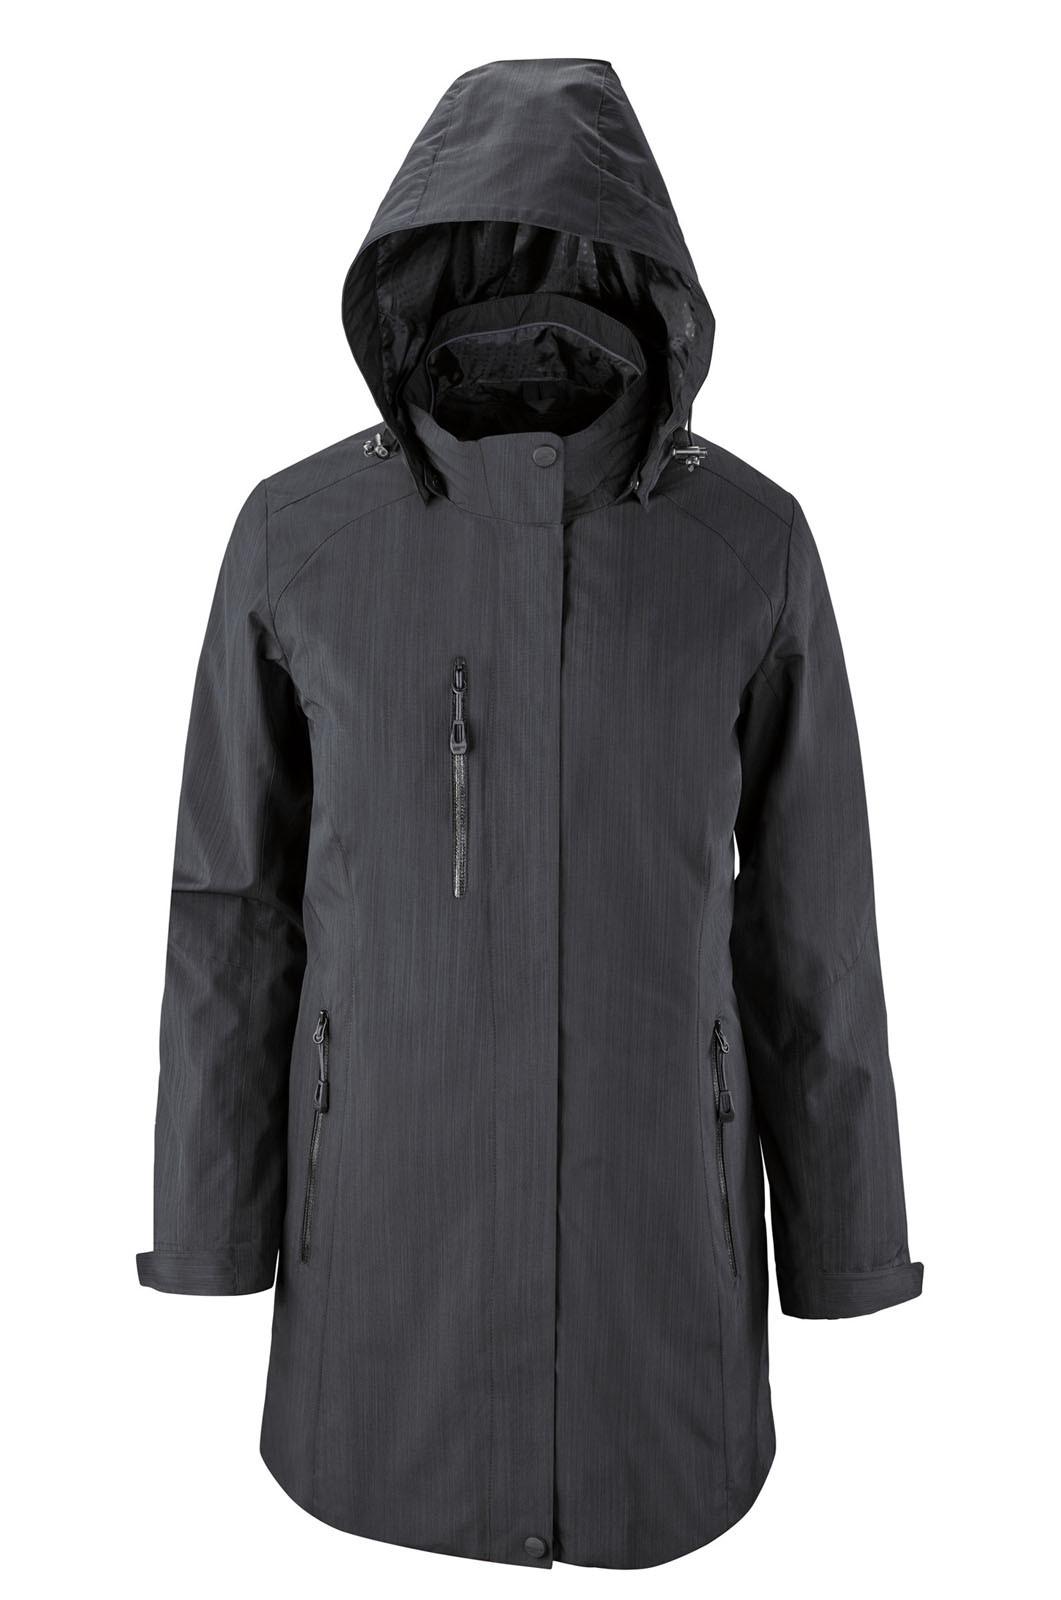 Ash City Lightweight 78670 - Metropolitan Ladies' Lightweight City Length Jacket